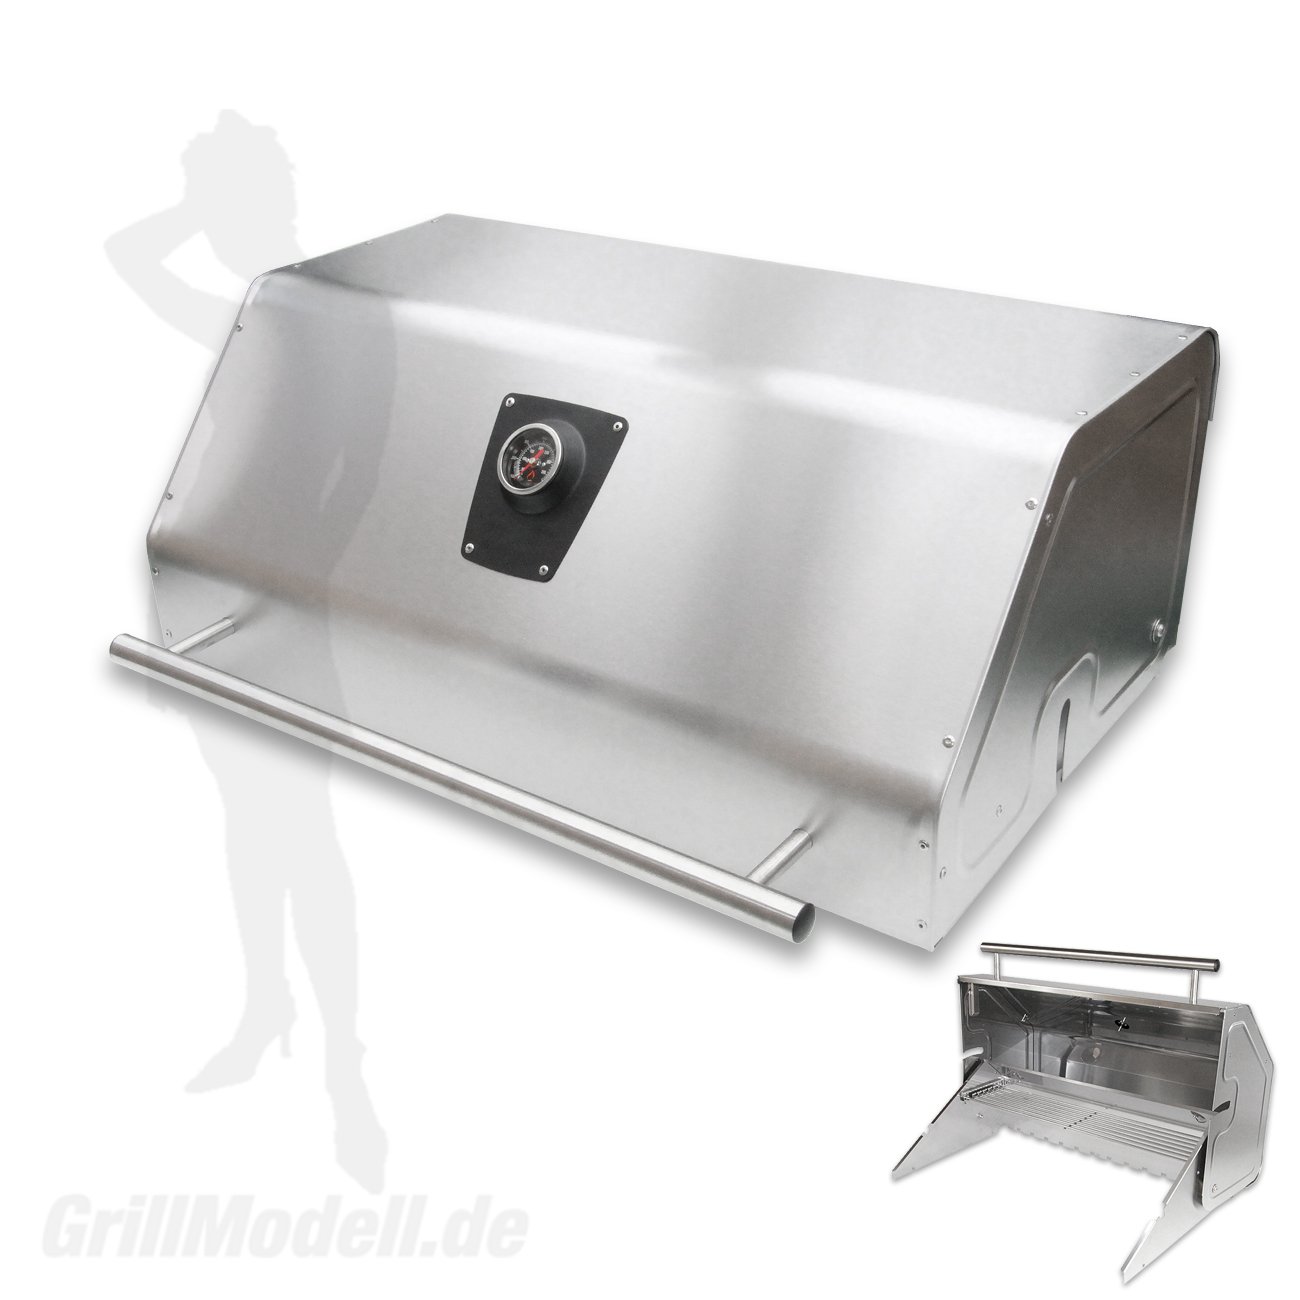 Edelstahl Grillhaube für Edelstahlgrill Holzkohlegrill Edelstar XL